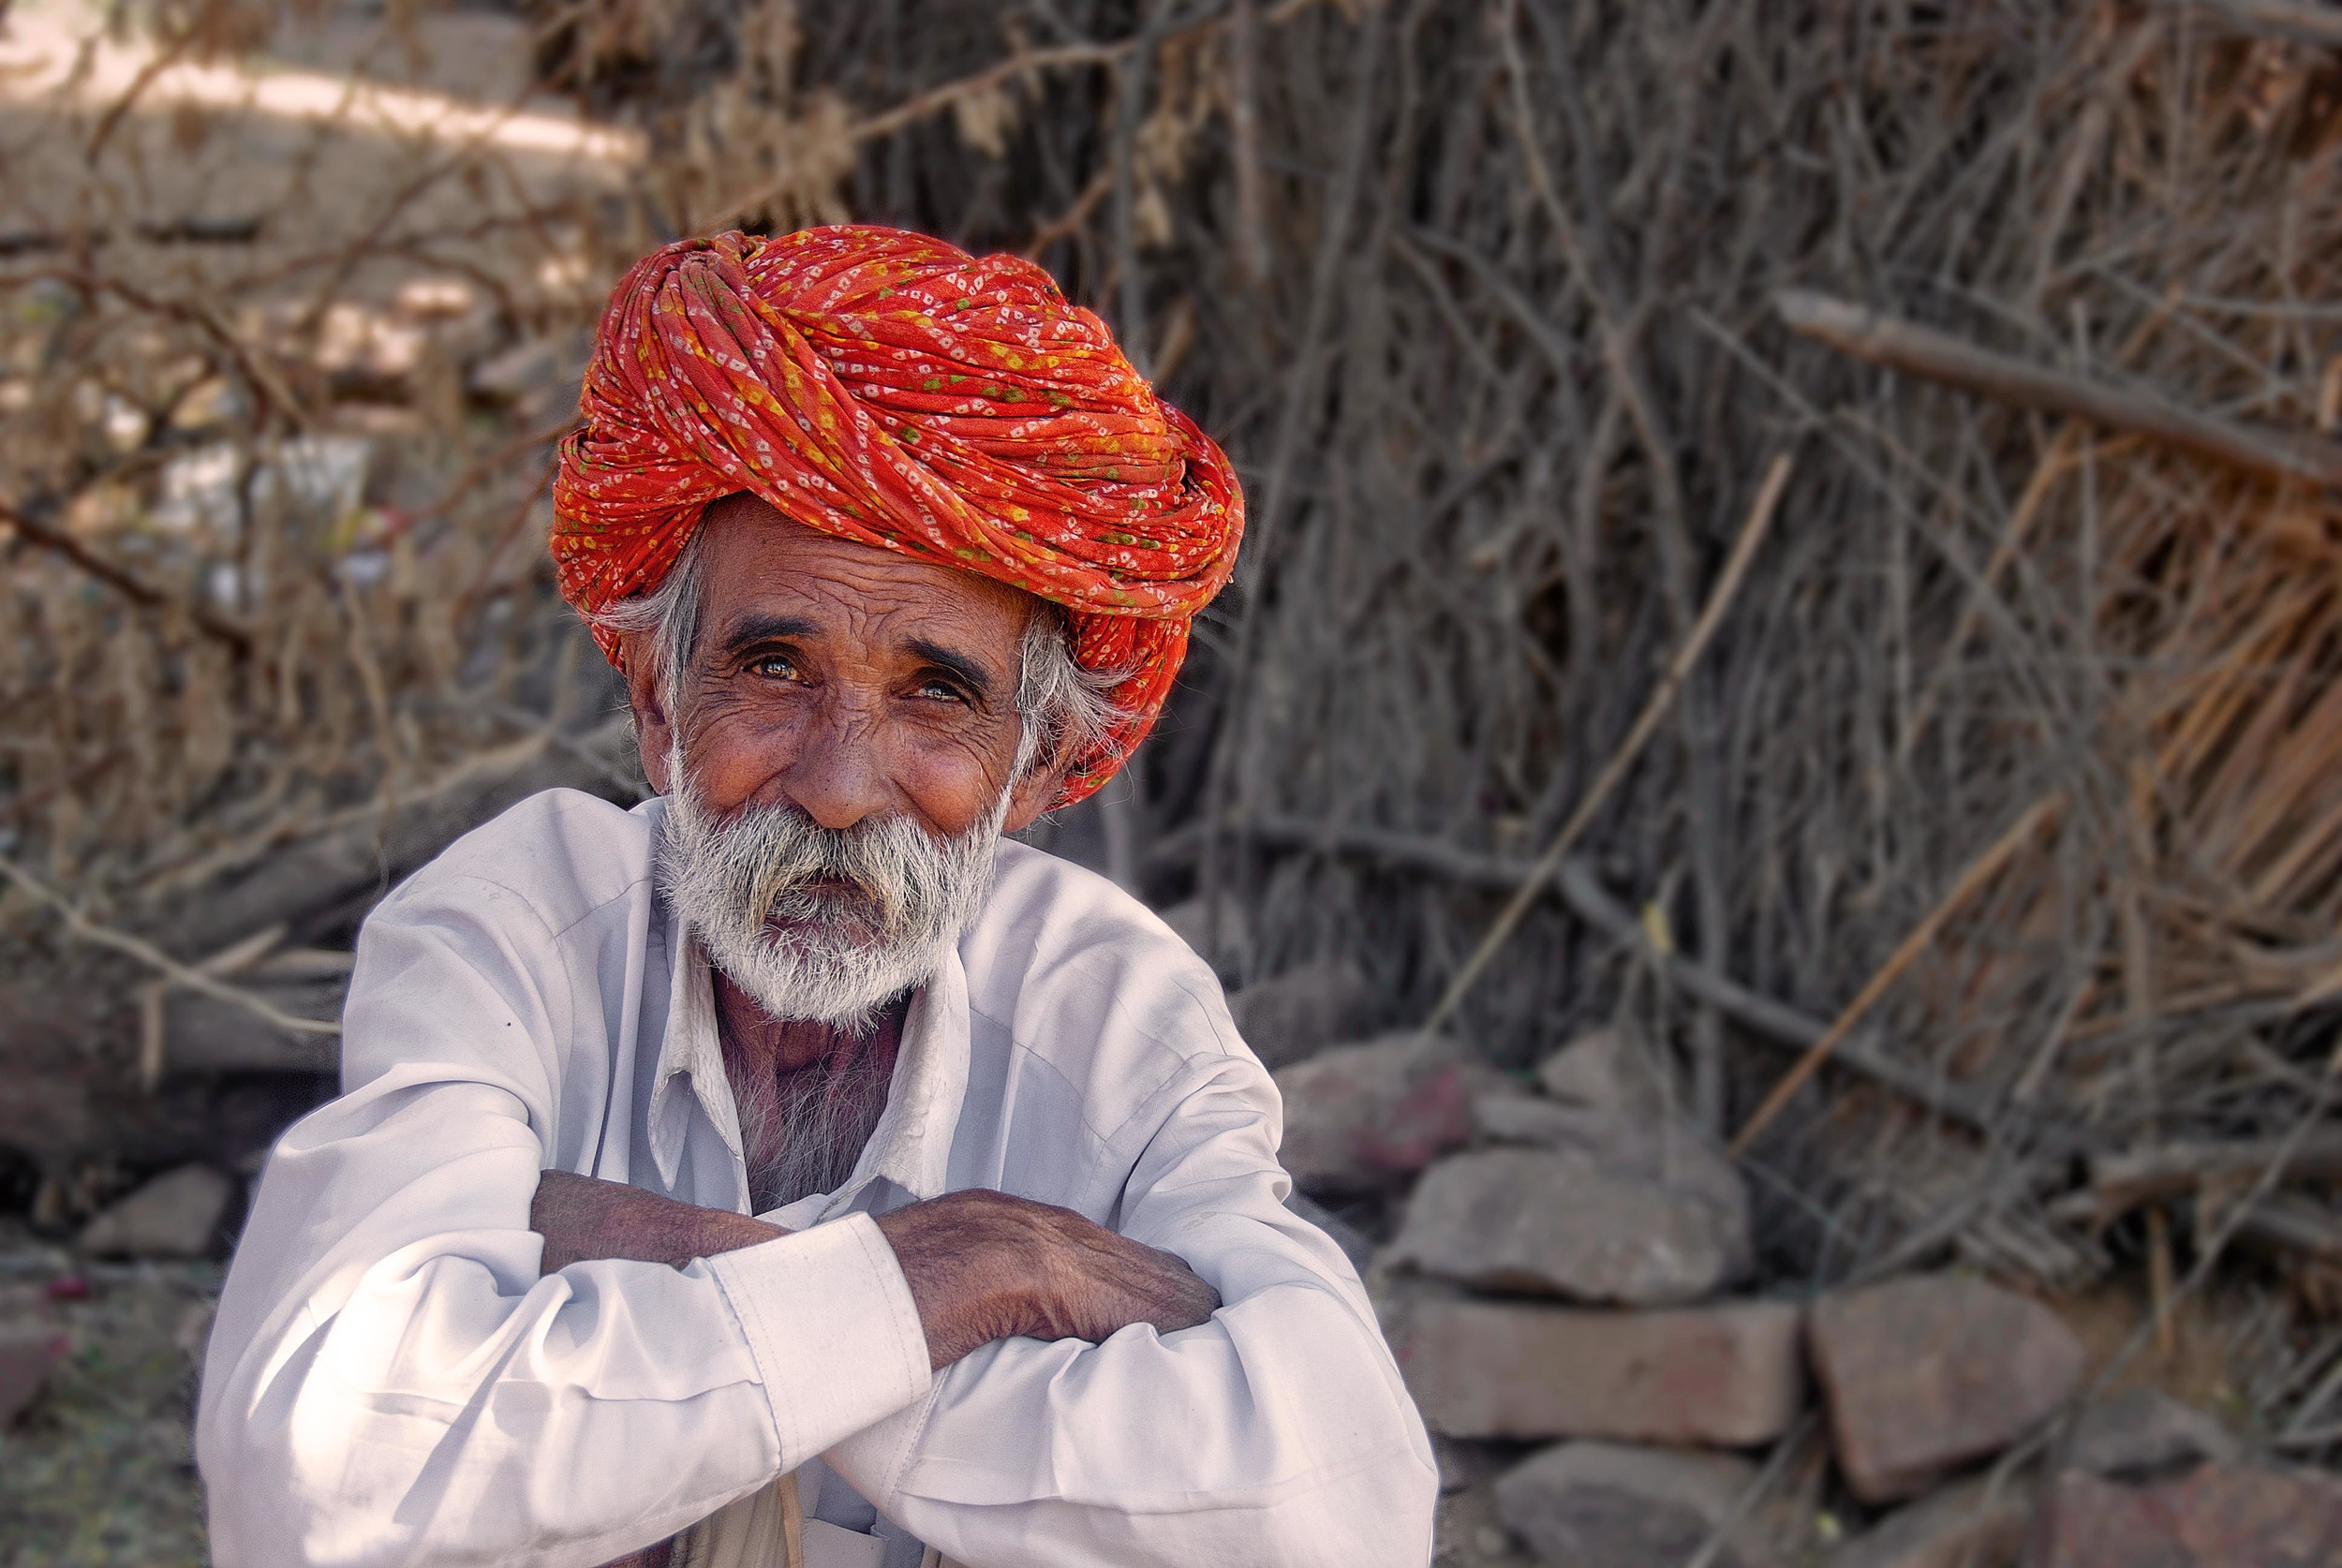 turbanman1.jpg